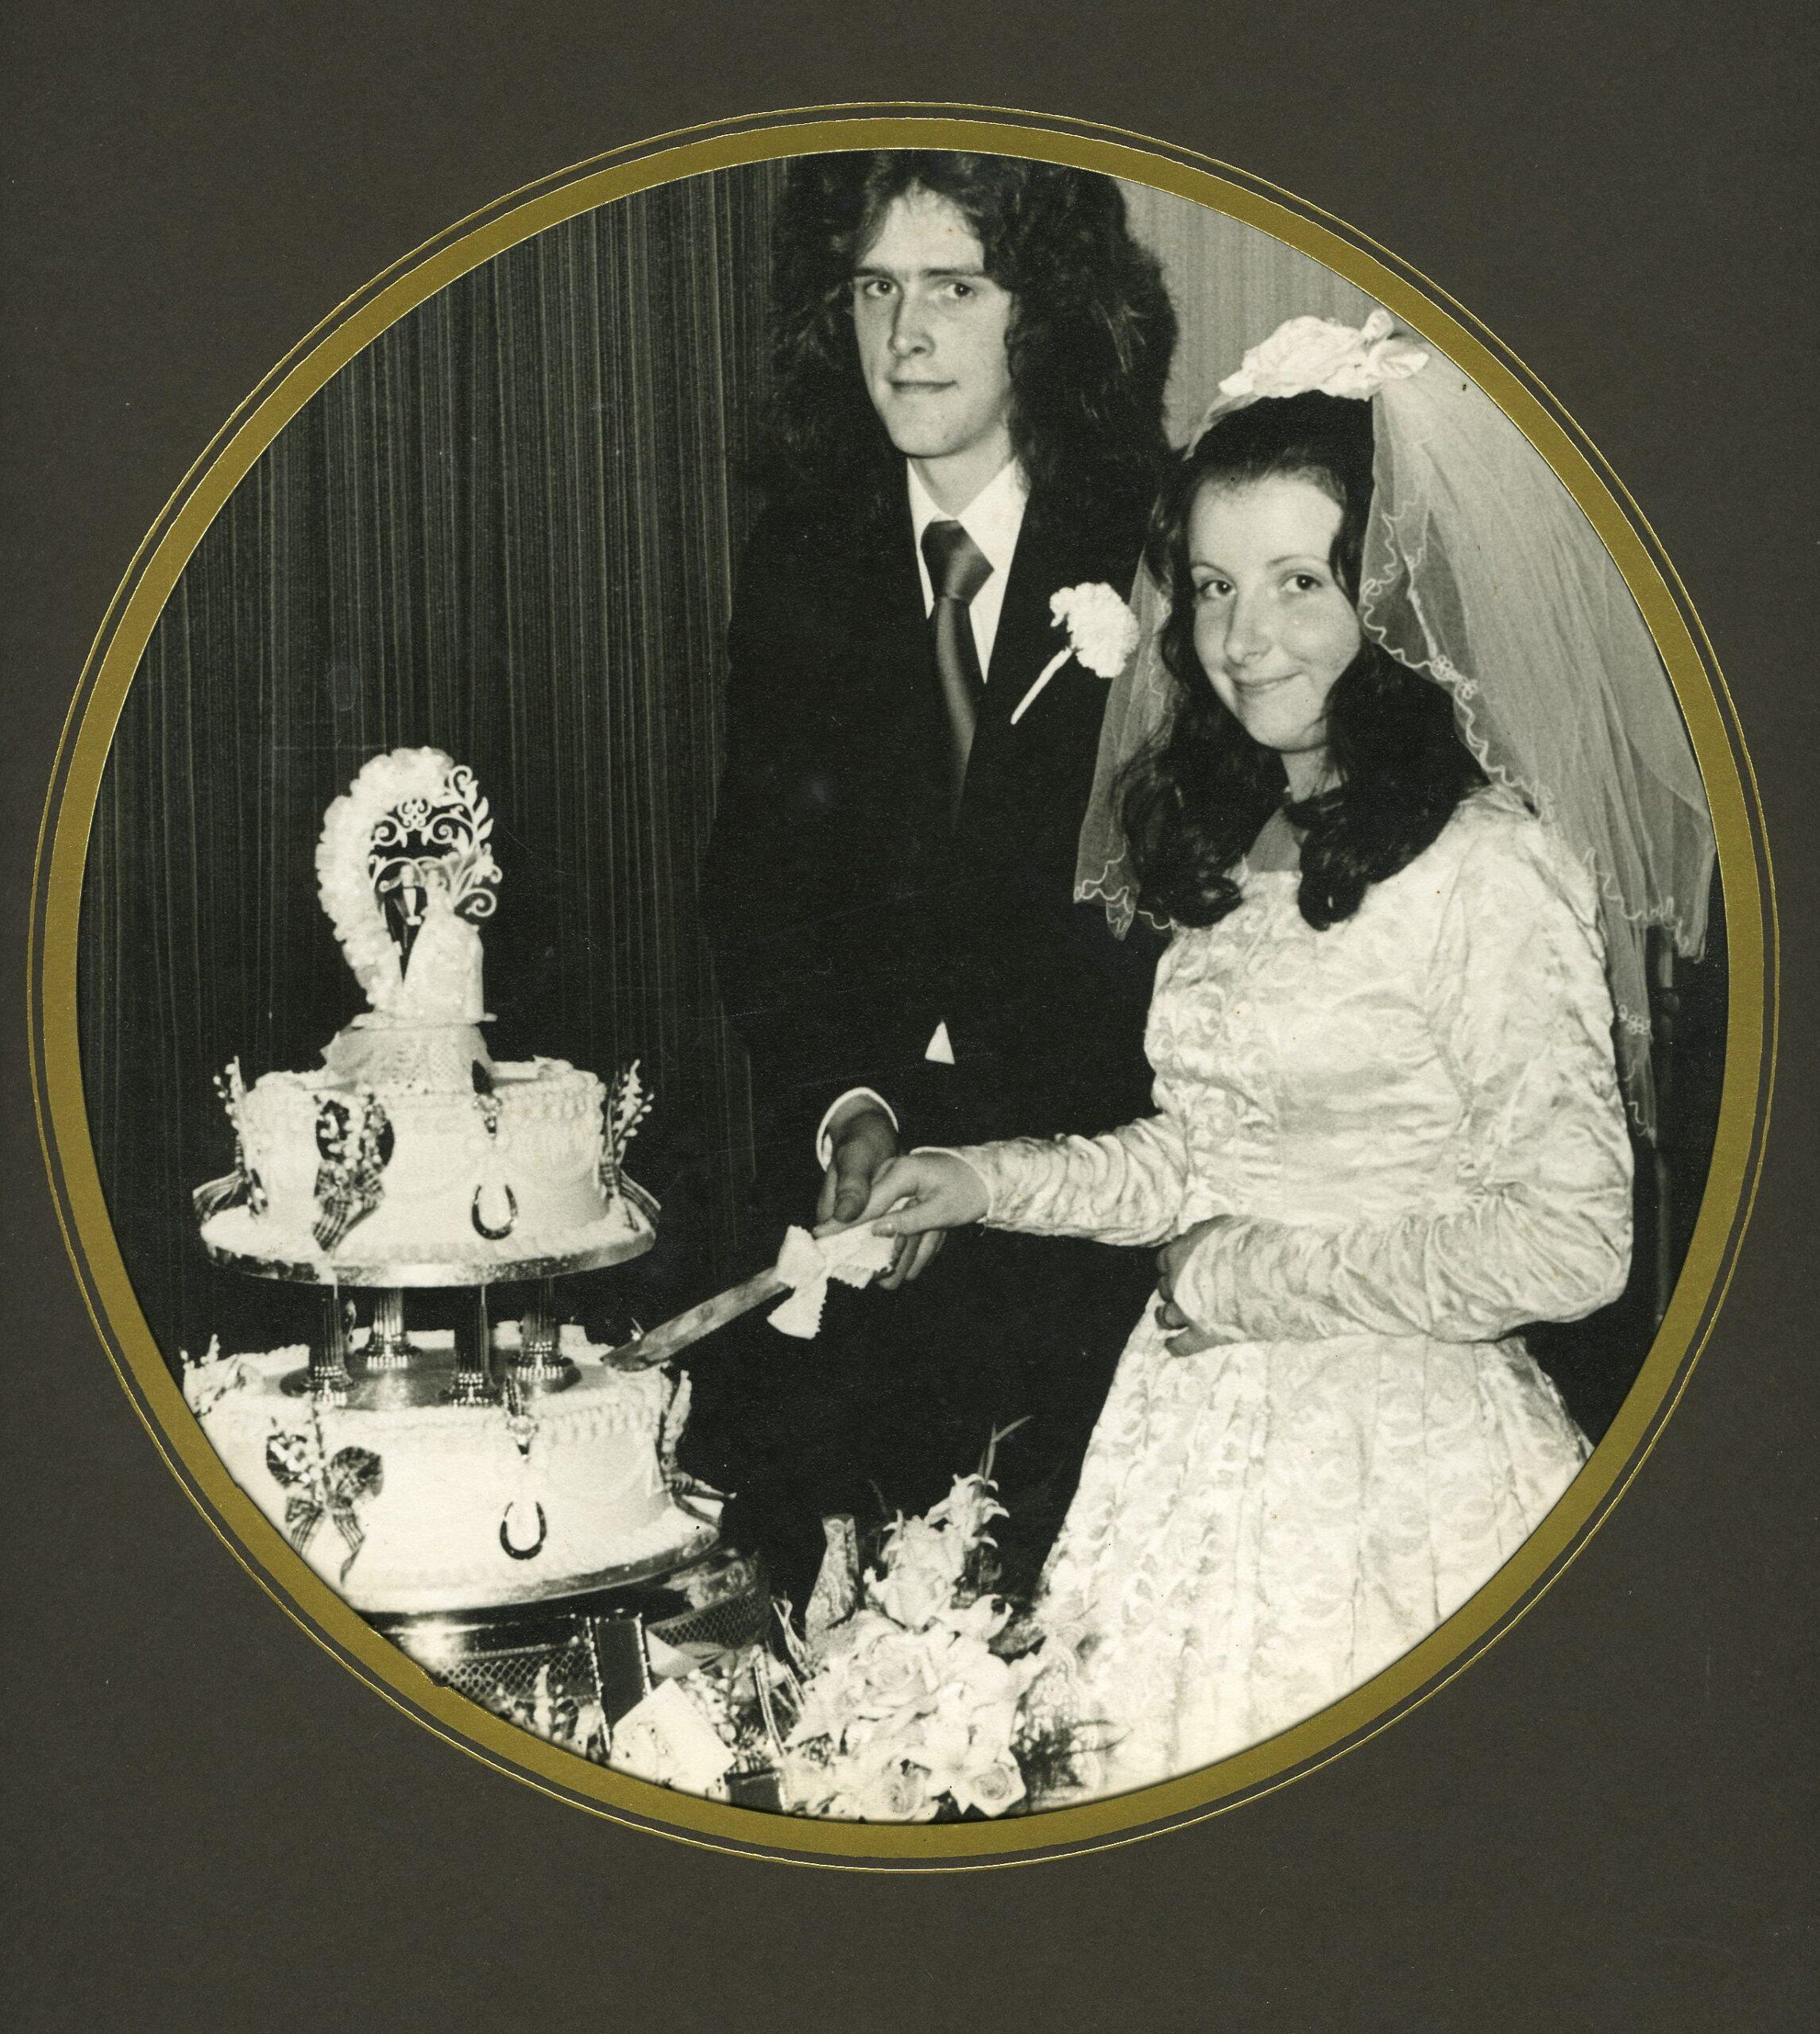 Kenny MacKay & Elaine Stewart's Wedding